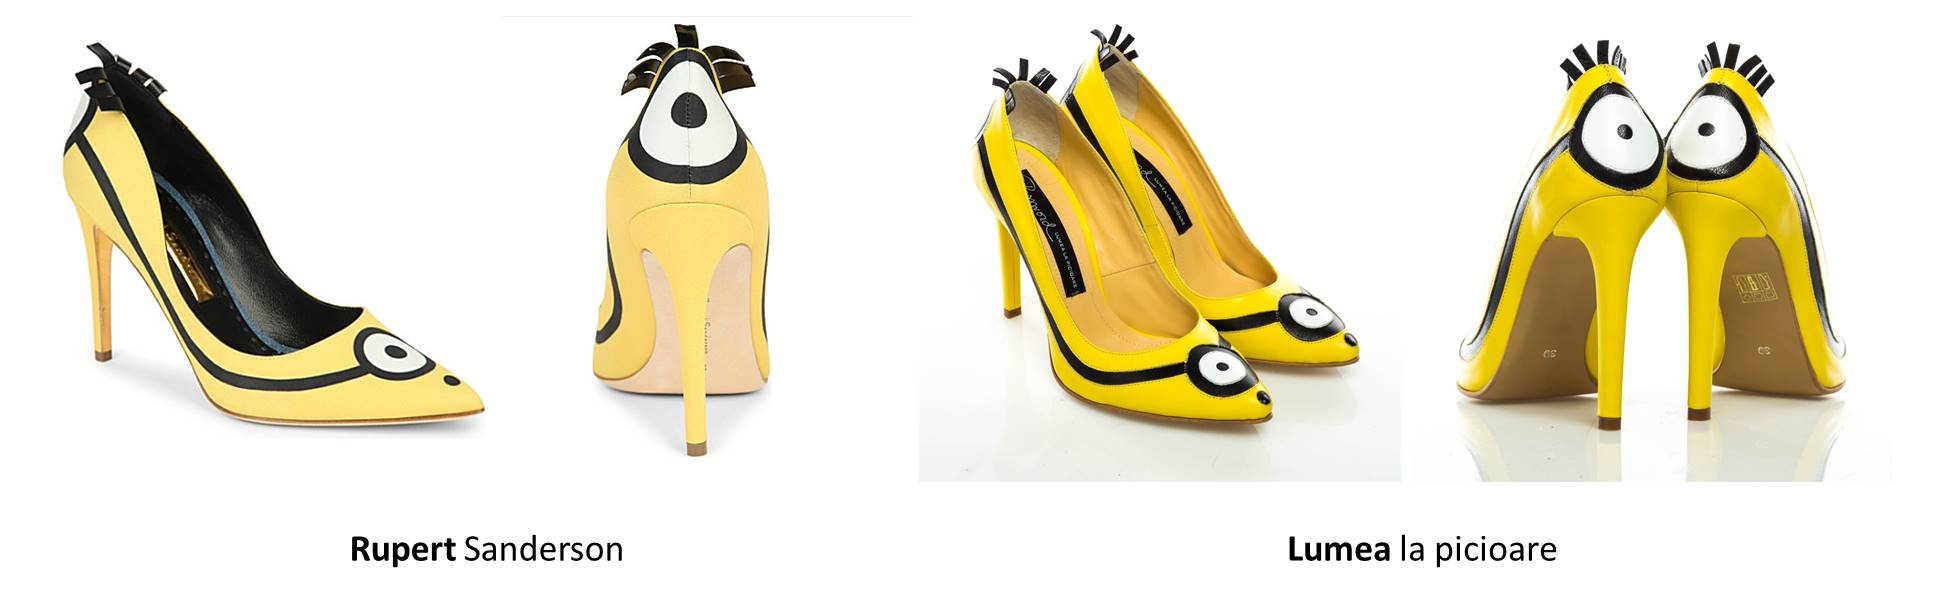 minions shoes real vs fake